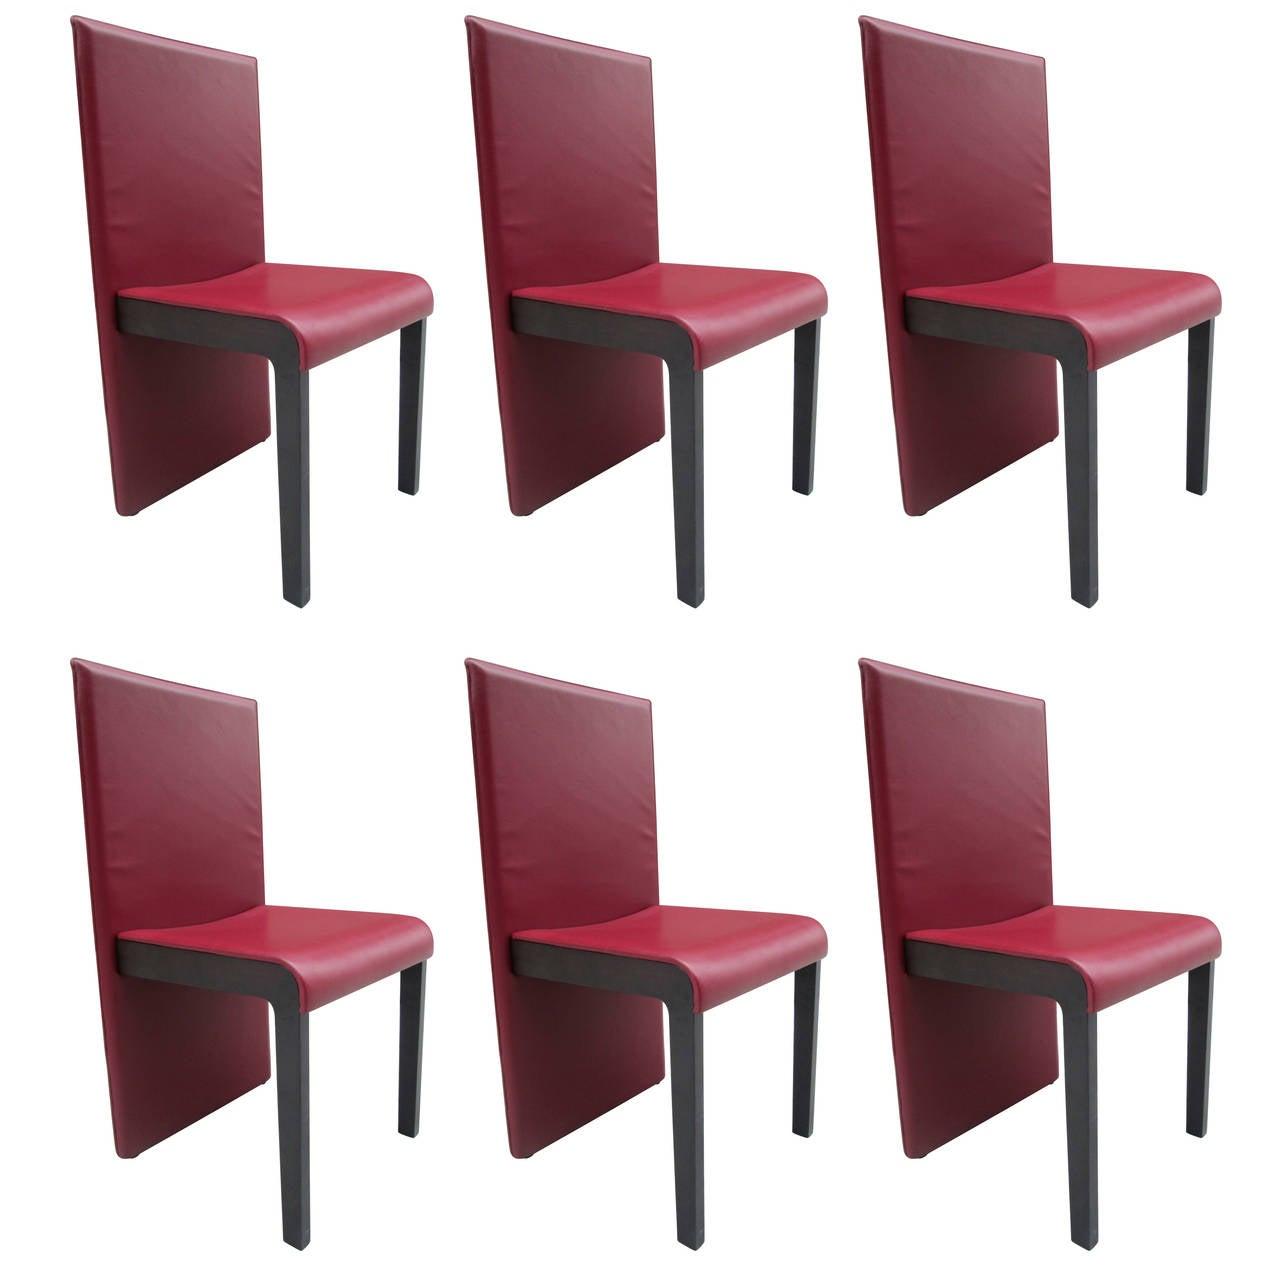 Leather sofa by poltrona frau at 1stdibs - Six Leather Dining Chairs By Poltrona Frau 1